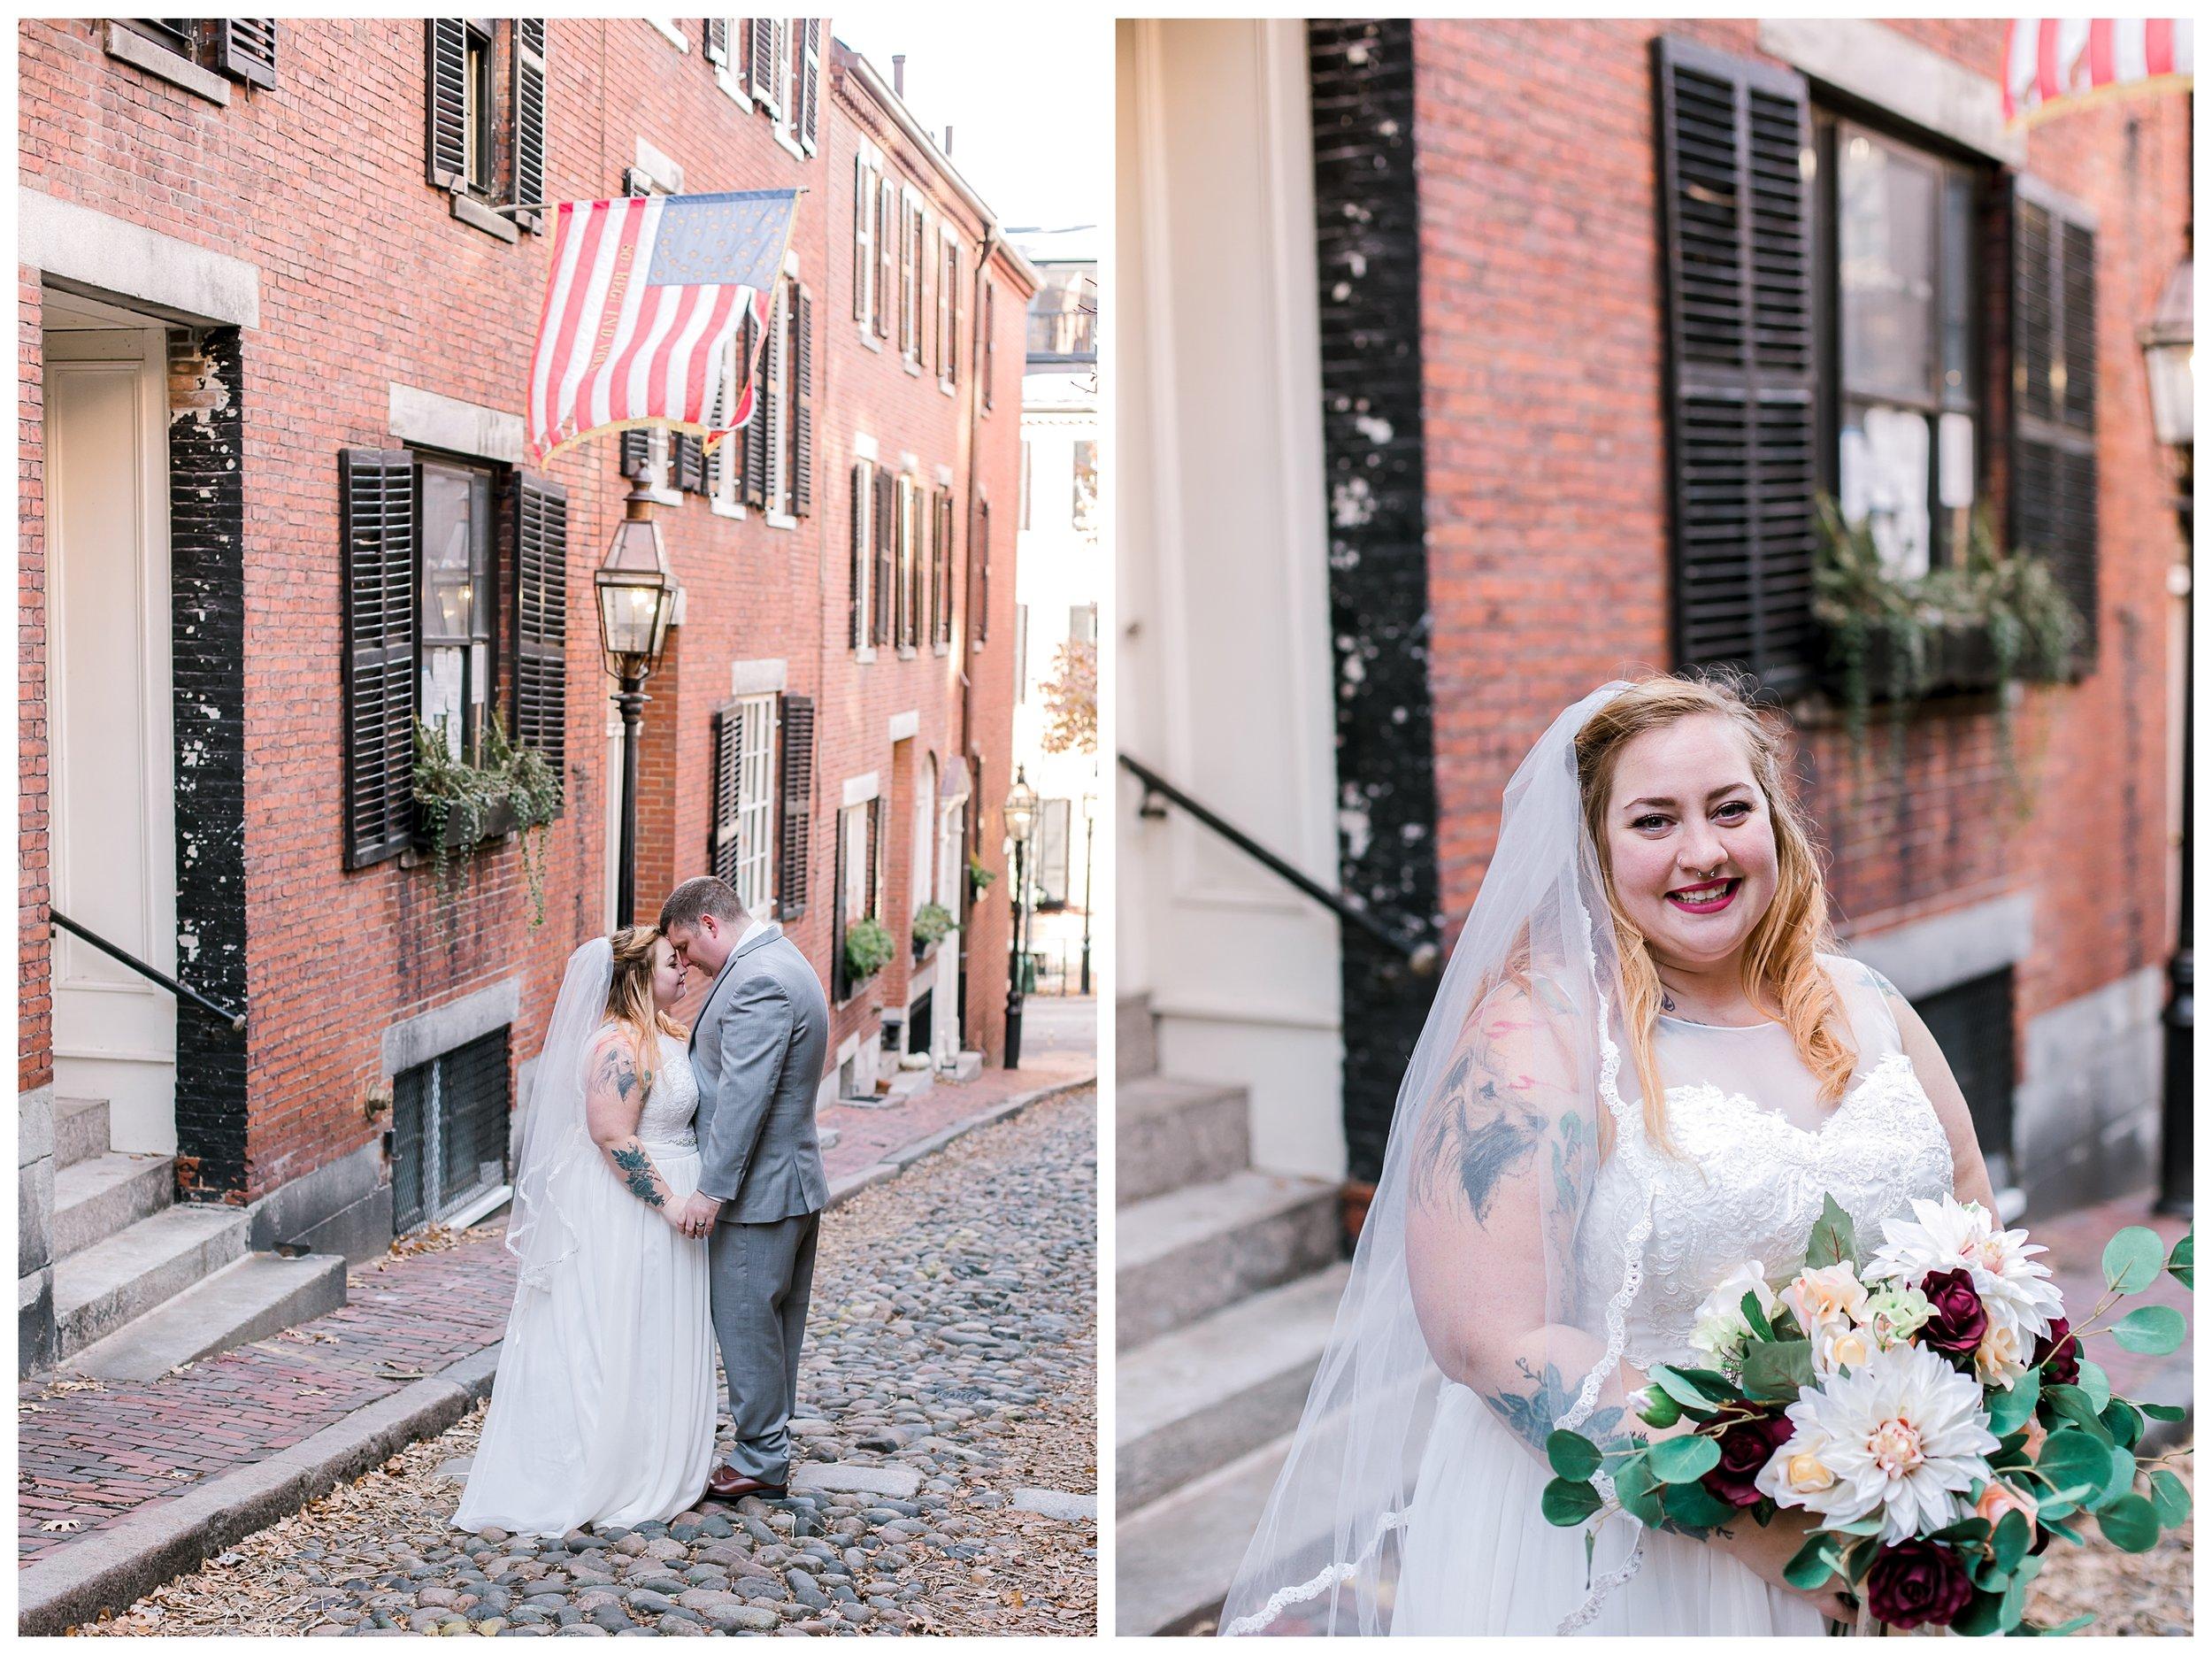 boston_acorn_street_elopement_photos_erica_pezente_photography (4).jpg